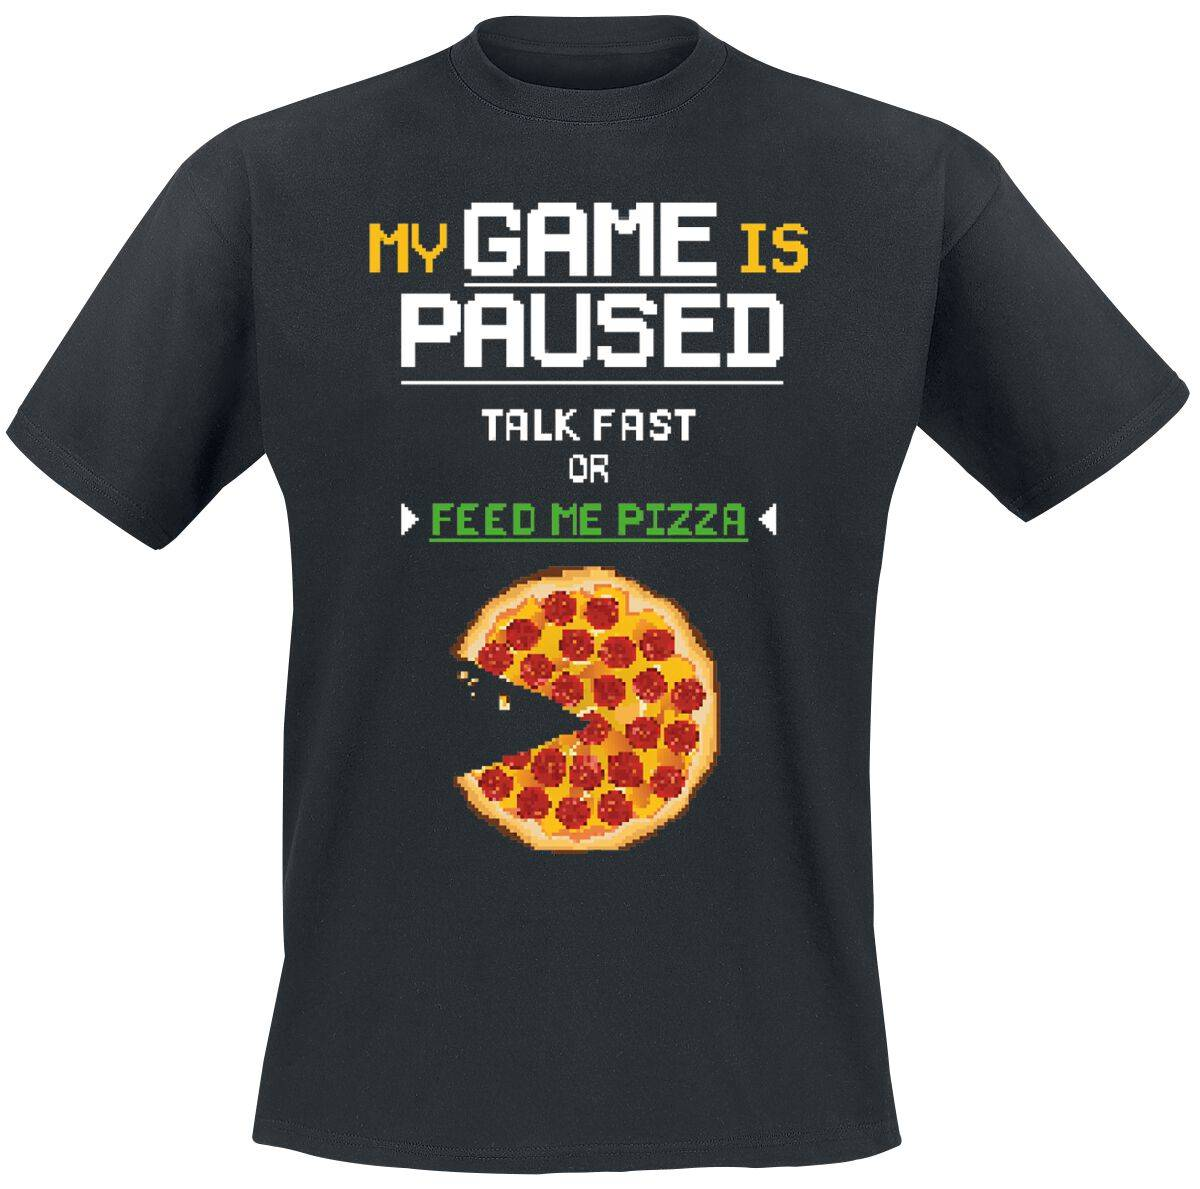 My Game Is Paused. Talk Fast Or Feed Me Pizza. Herren-T-Shirt  - Offizieller & Lizenzierter Fanartikel schwarz